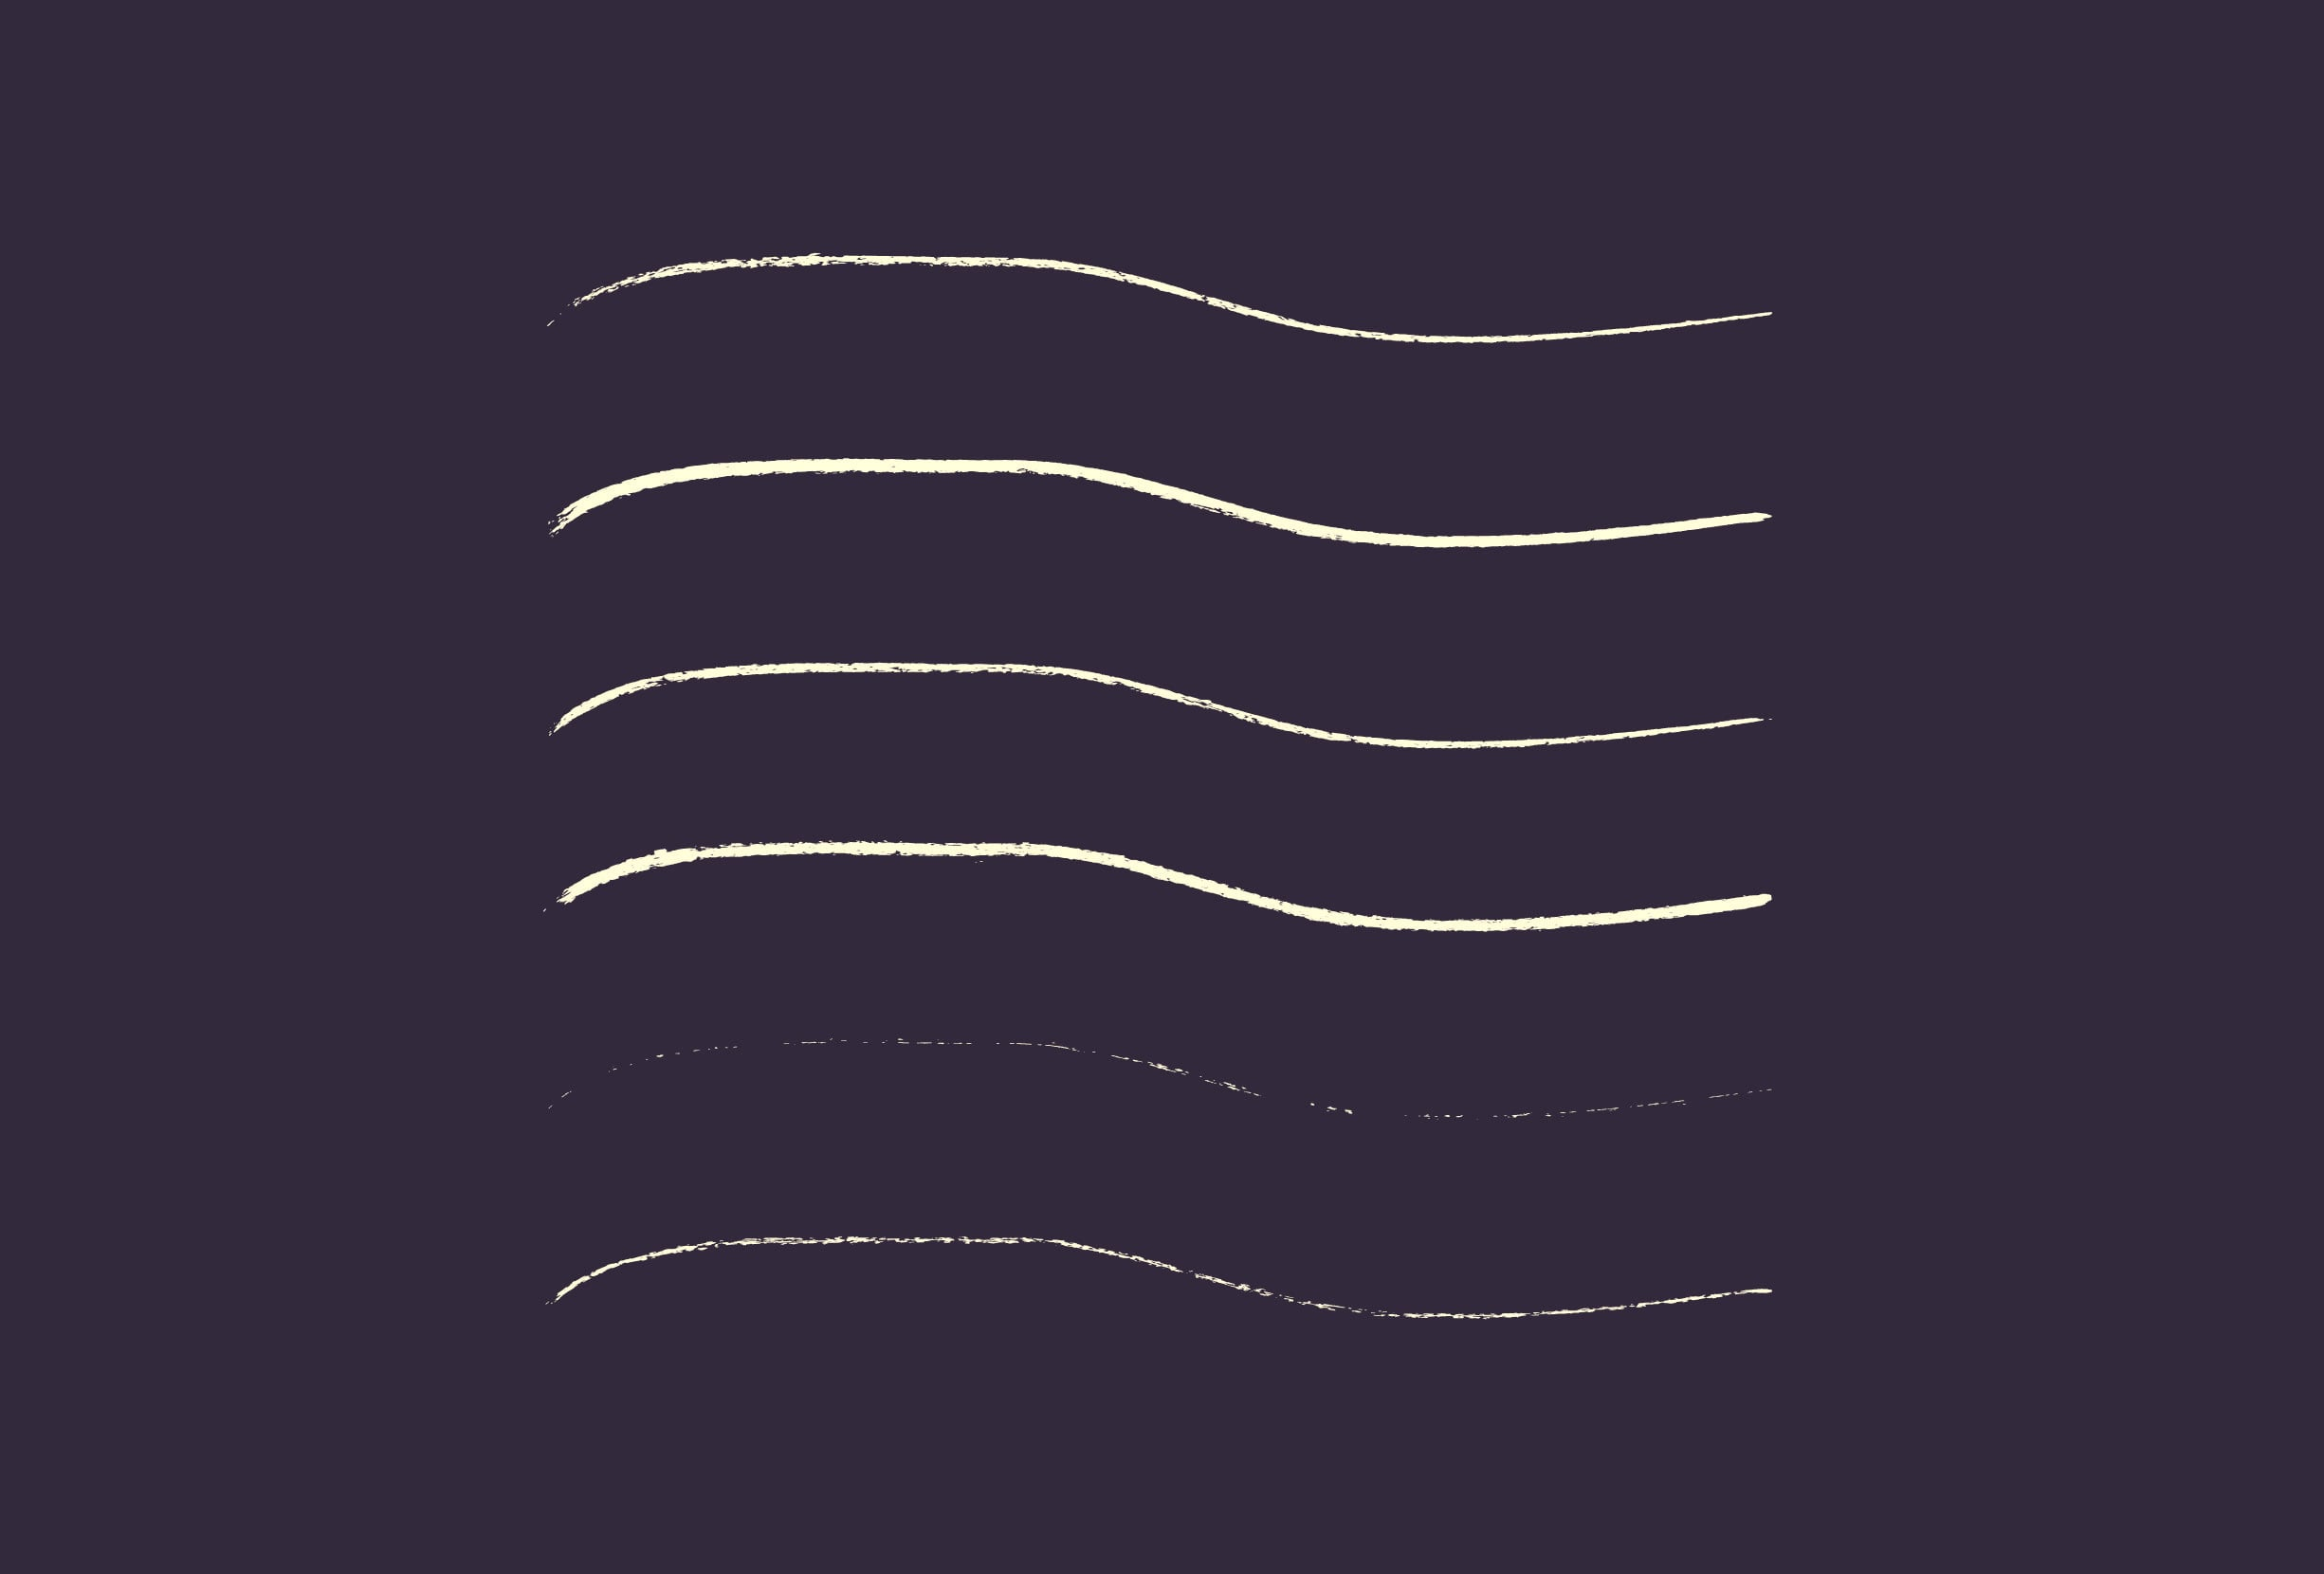 30 Best Line Art Illustrator Brushes (Wax Crayons) - brushes presentation 1 0